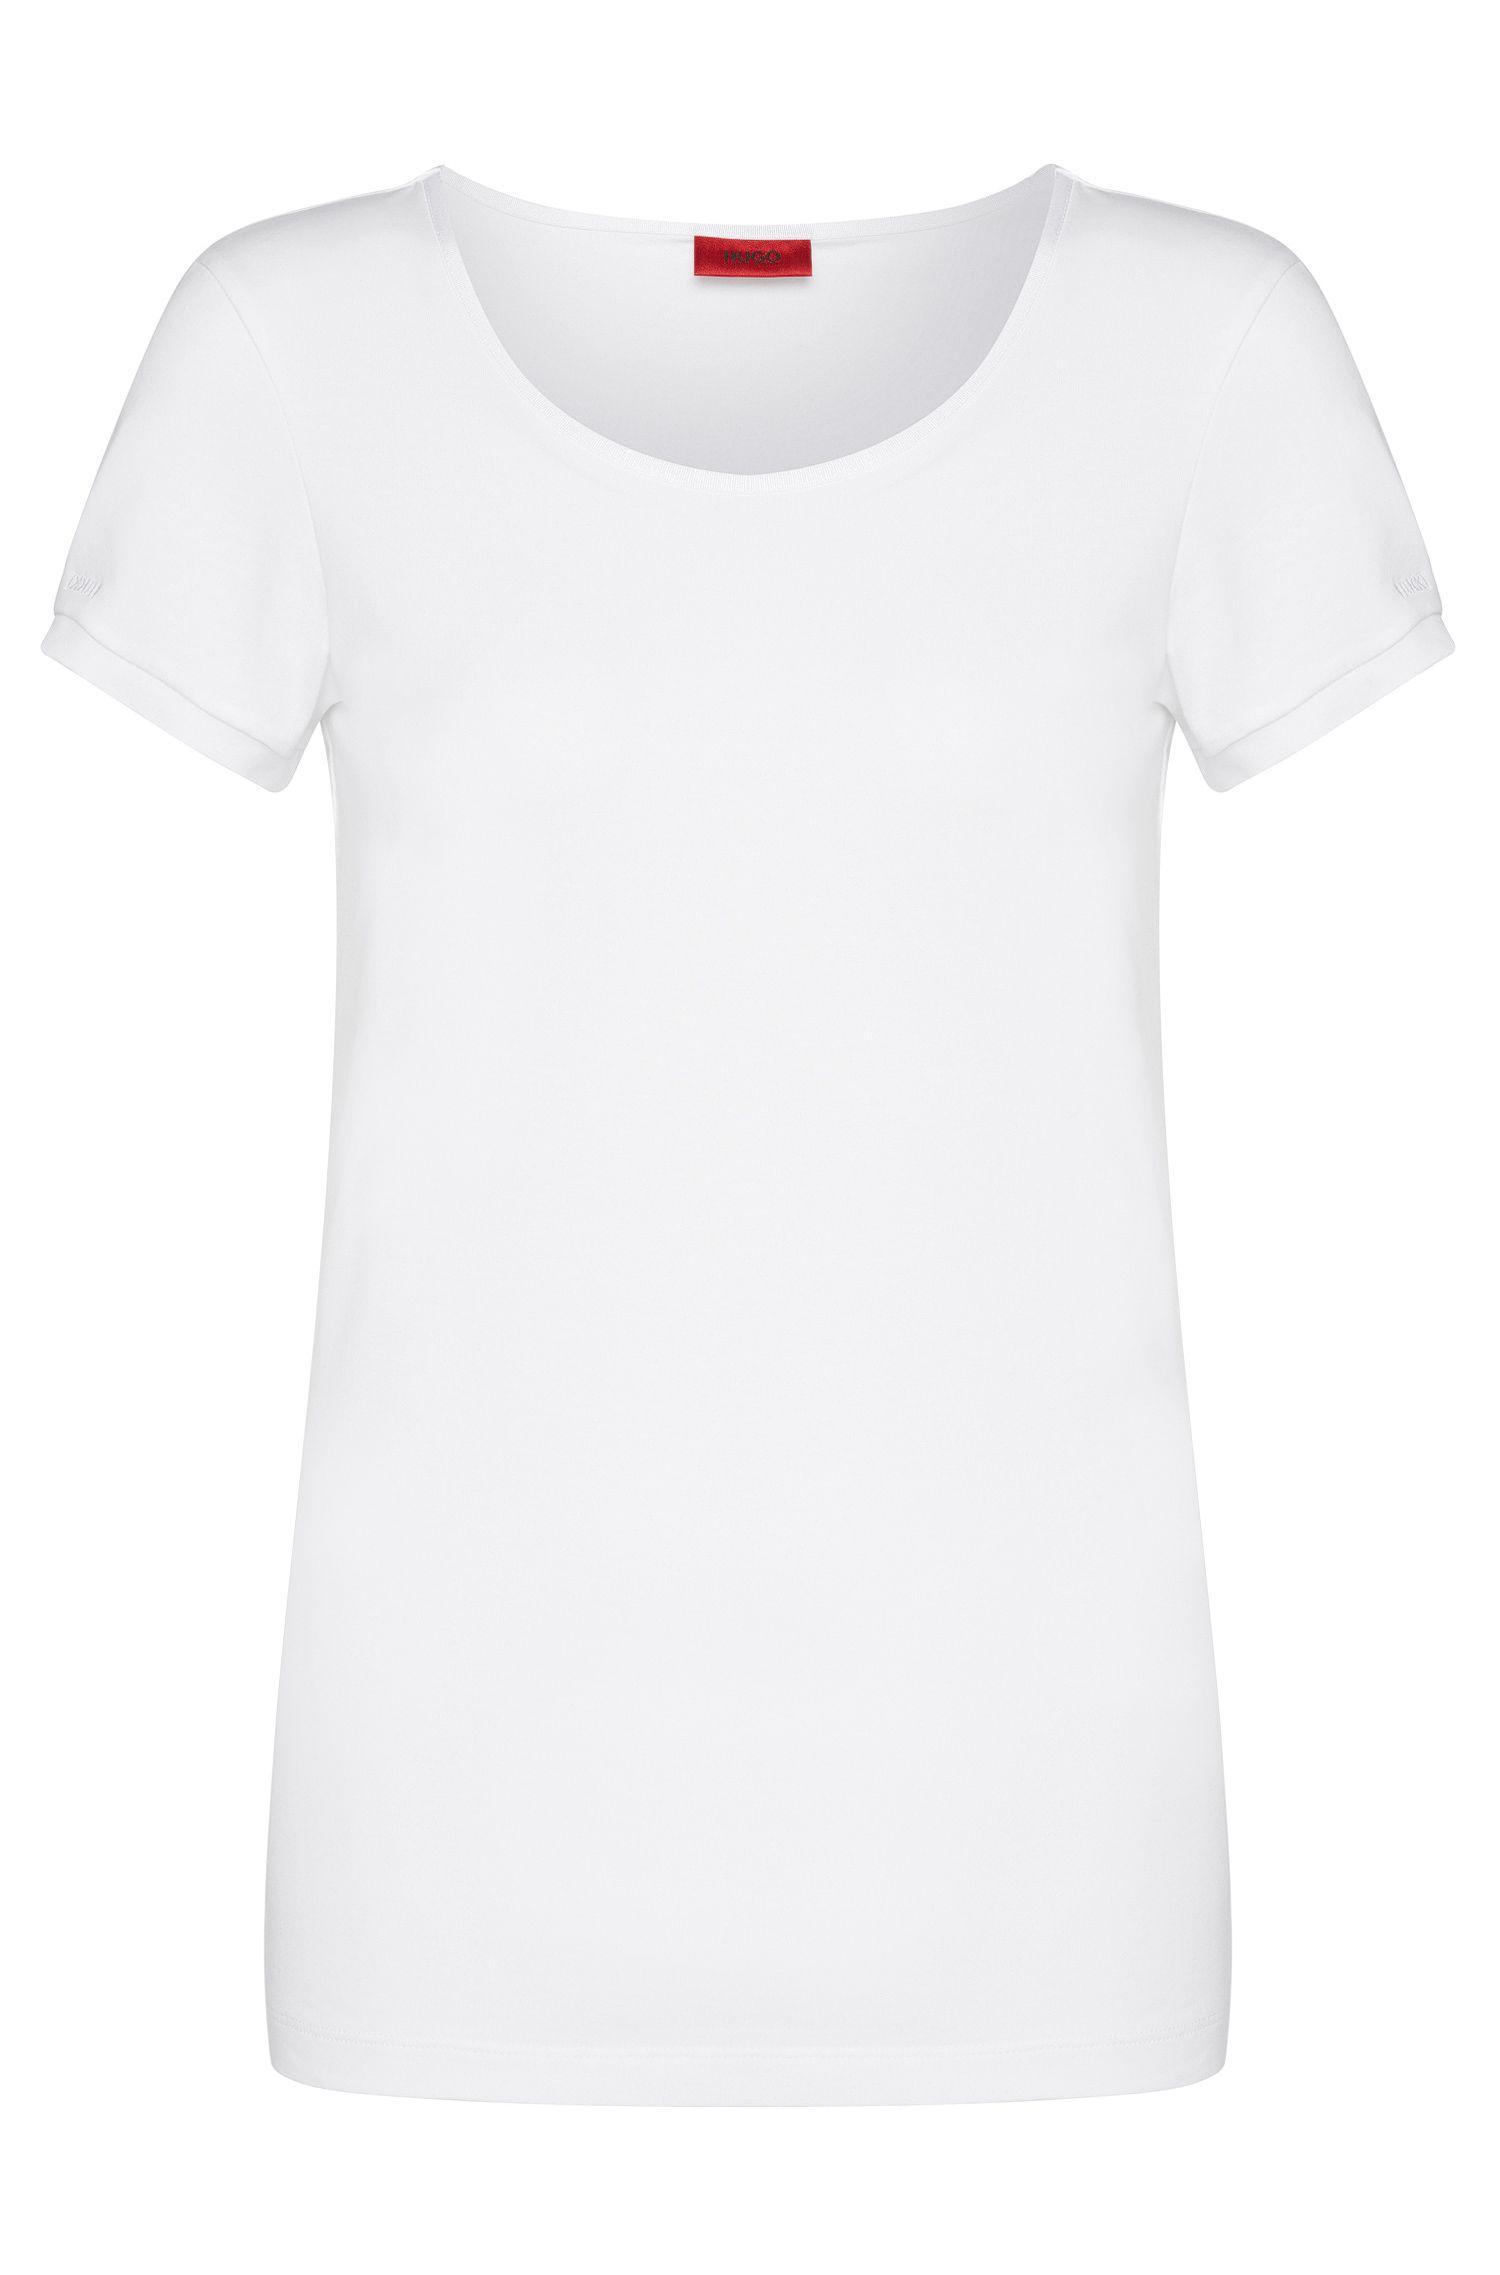 Unifarbenes T-Shirt aus Stretch-Baumwolle: 'Debana'